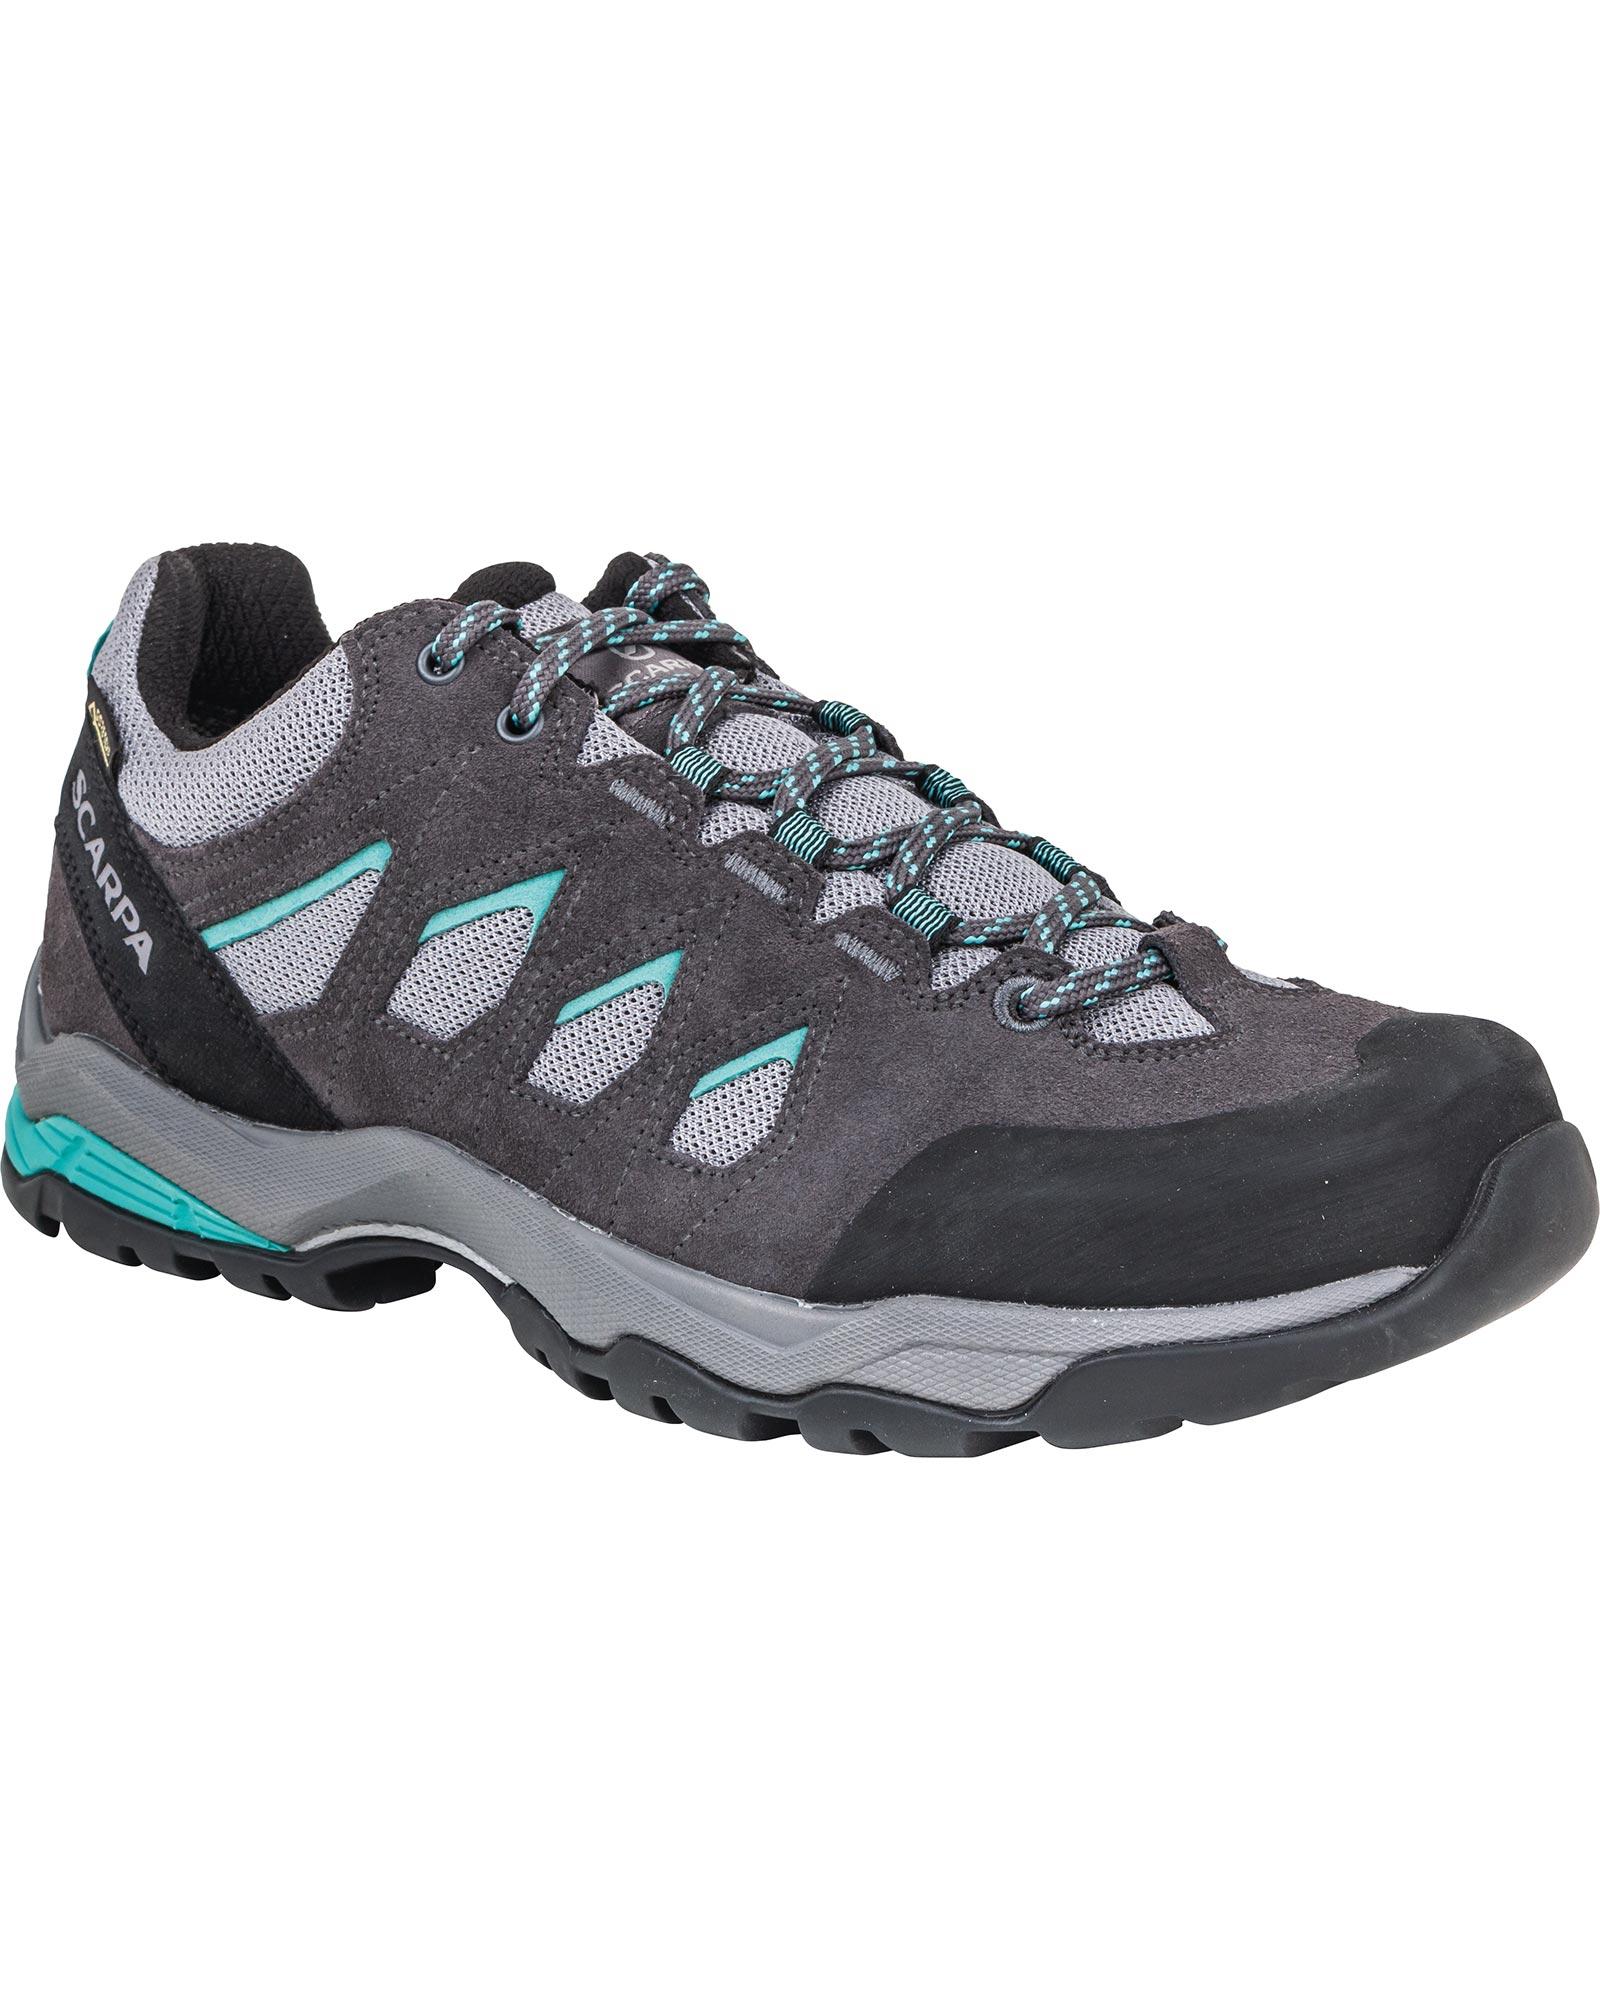 Scarpa Women's Moraine GORE-TEX Walking Shoes 0